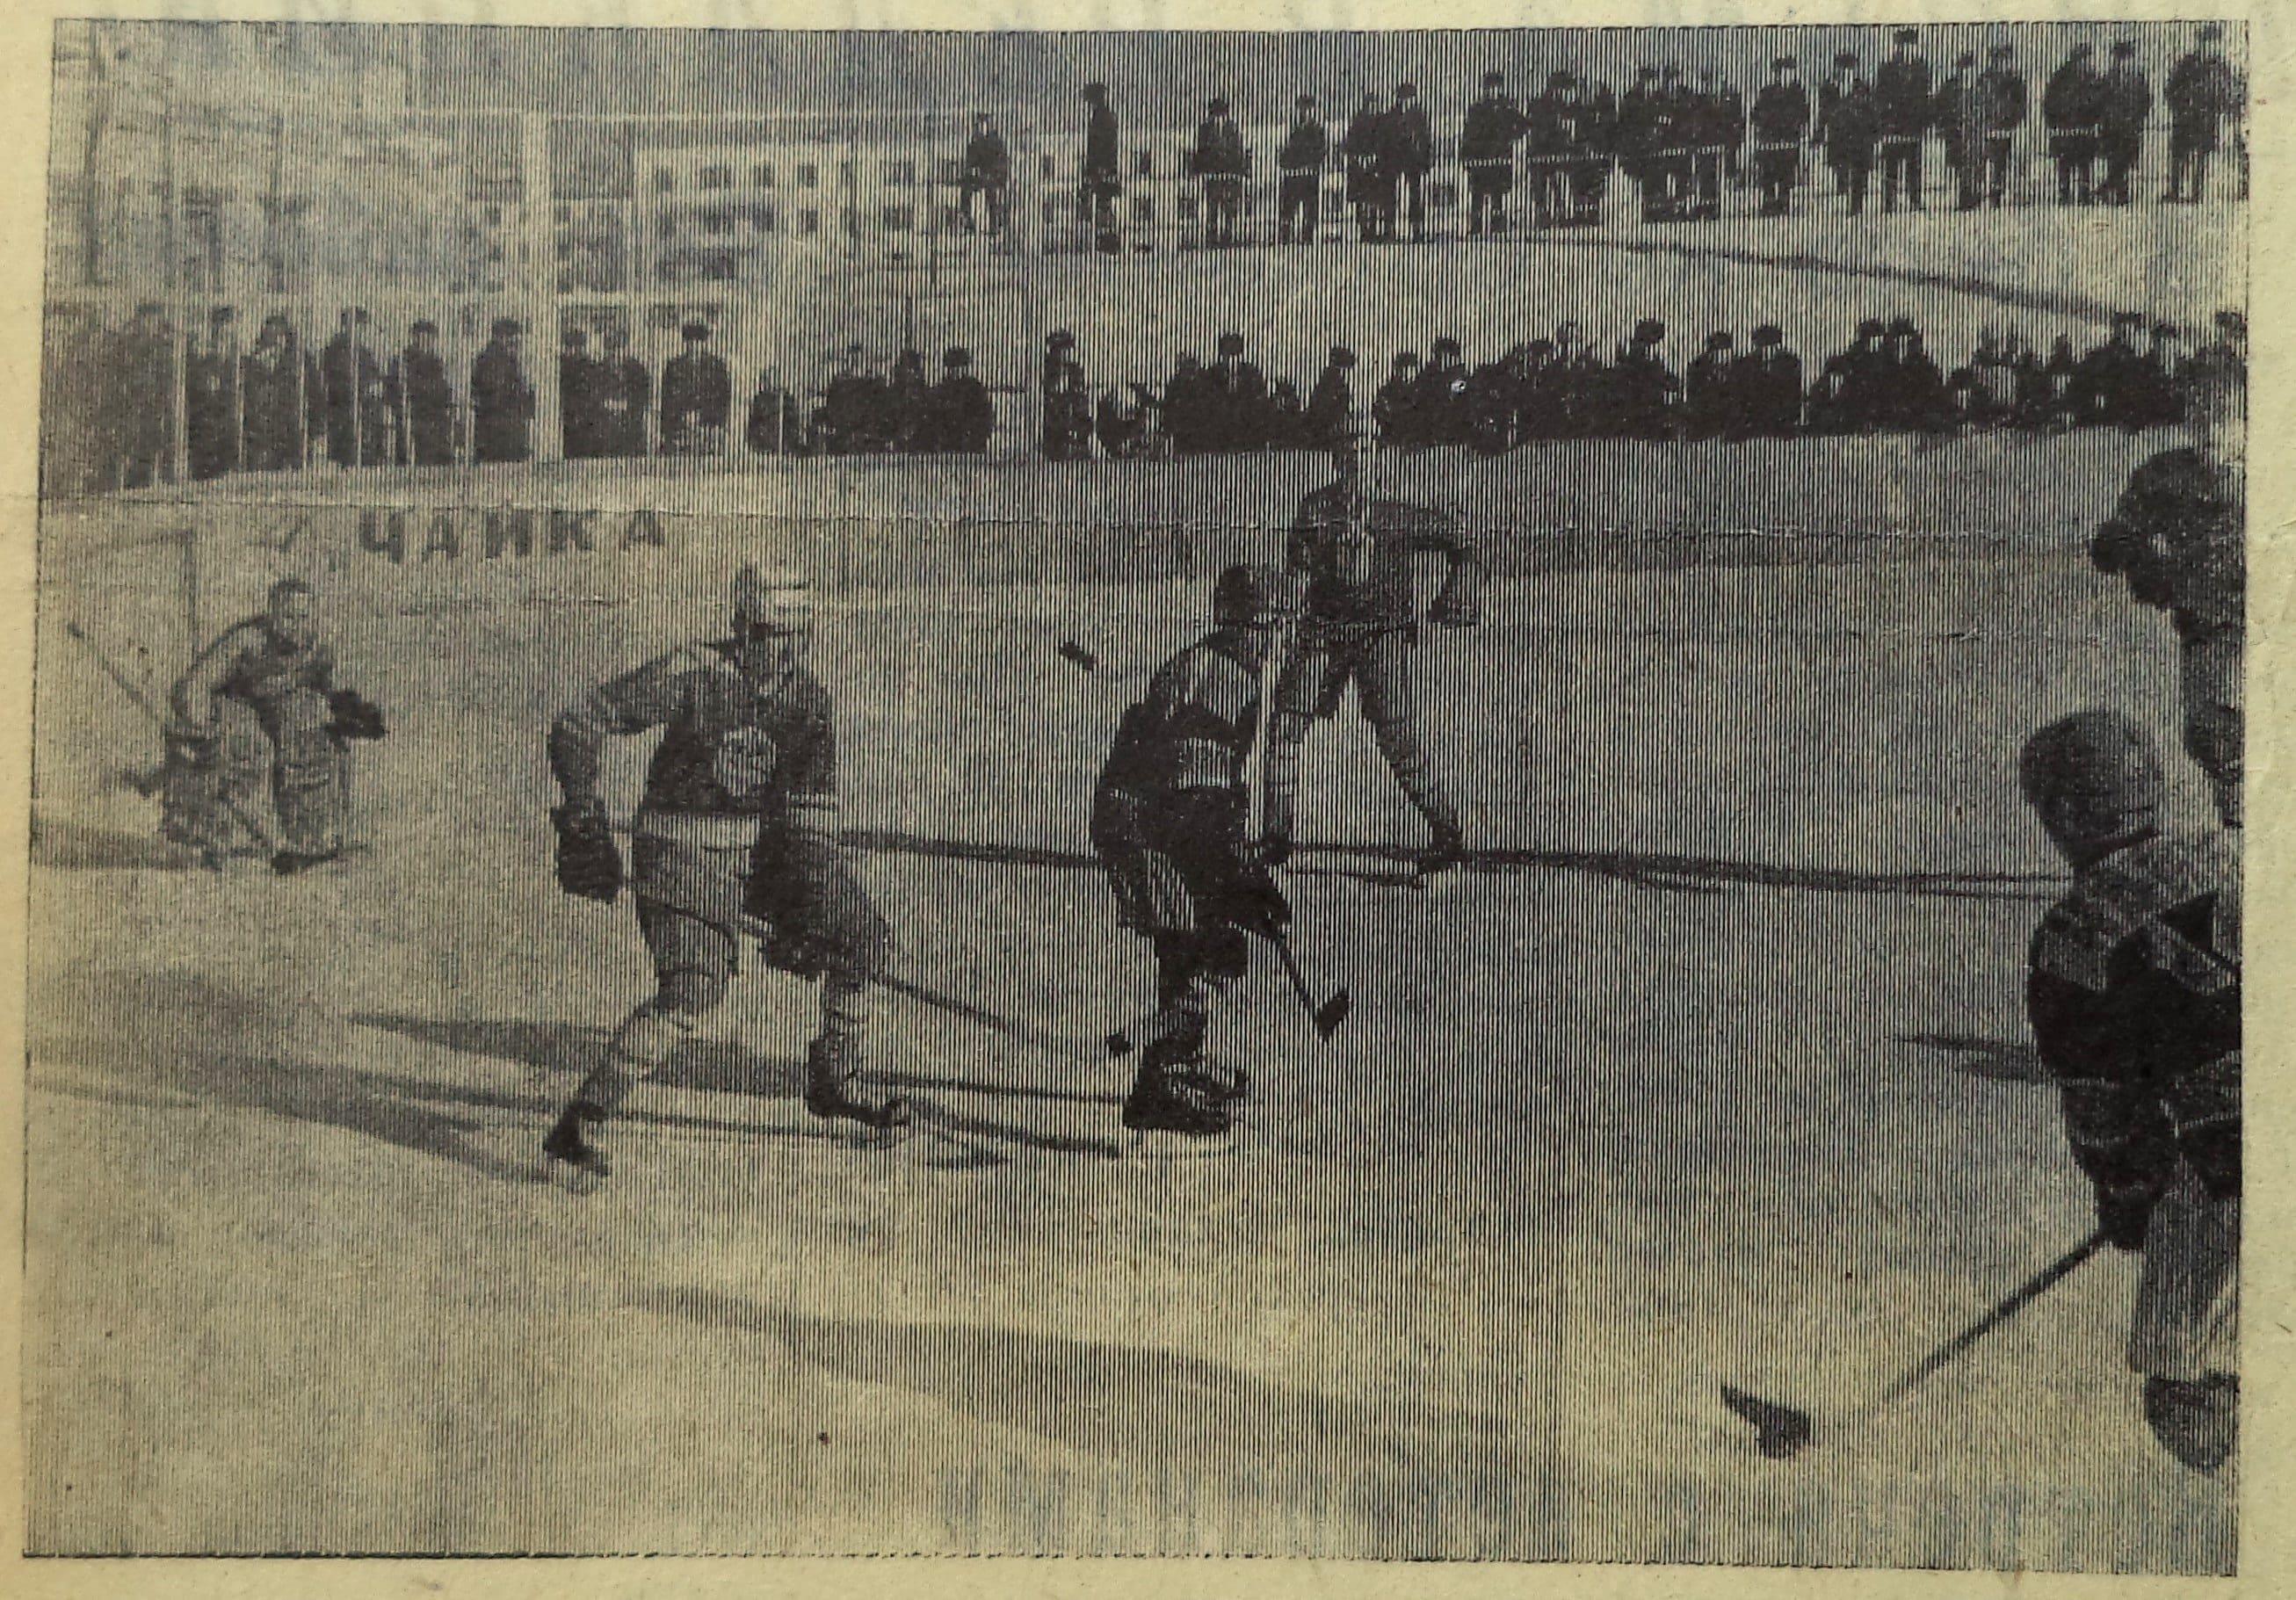 Сергея Лазо-ФОТО-37-Маяк-1974-03-04-фото хоккея со стадиона Чайка-min-min